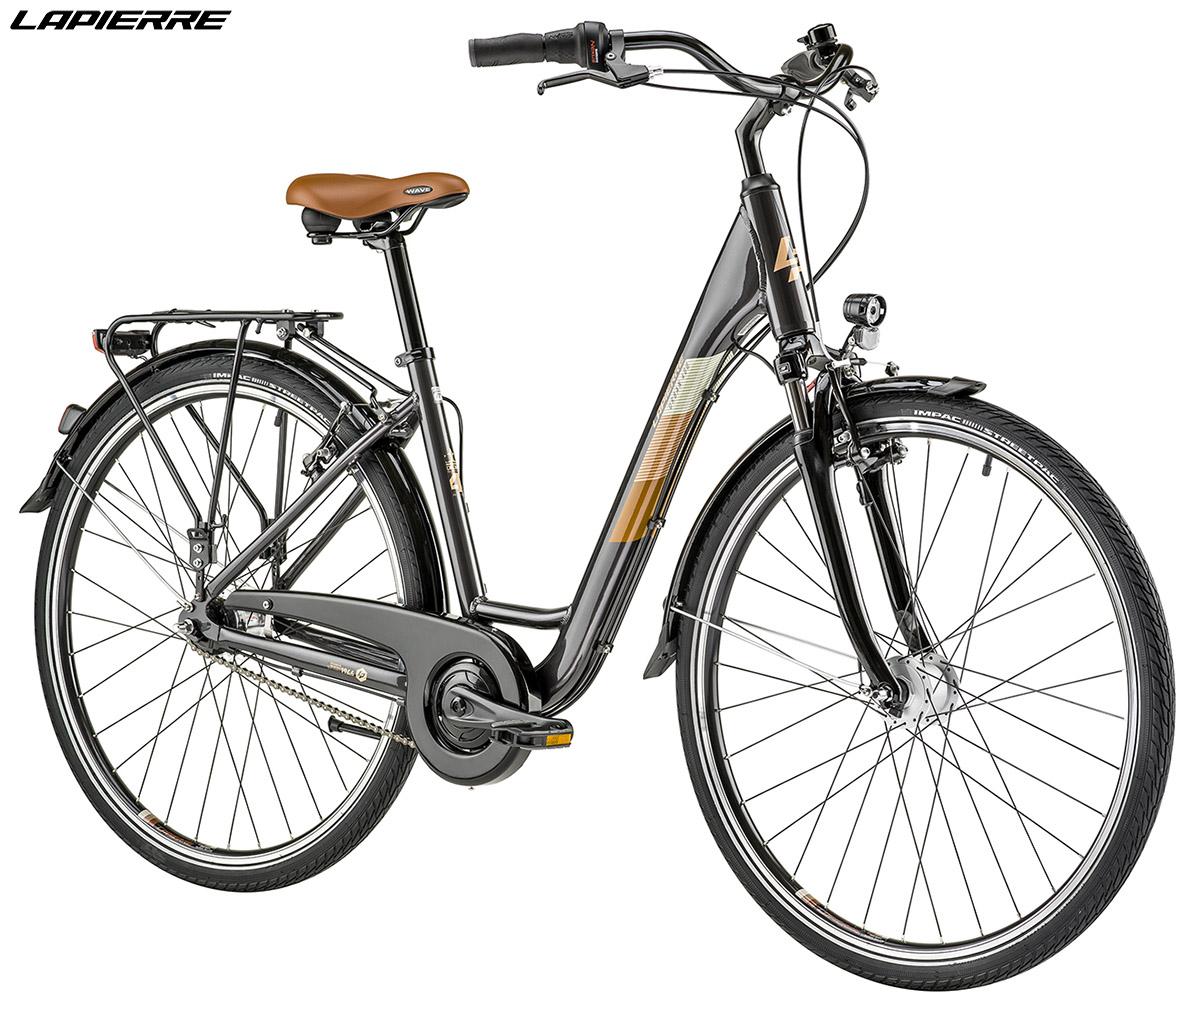 Una bici Lapierre Urban 400 dettagli laterali 2020